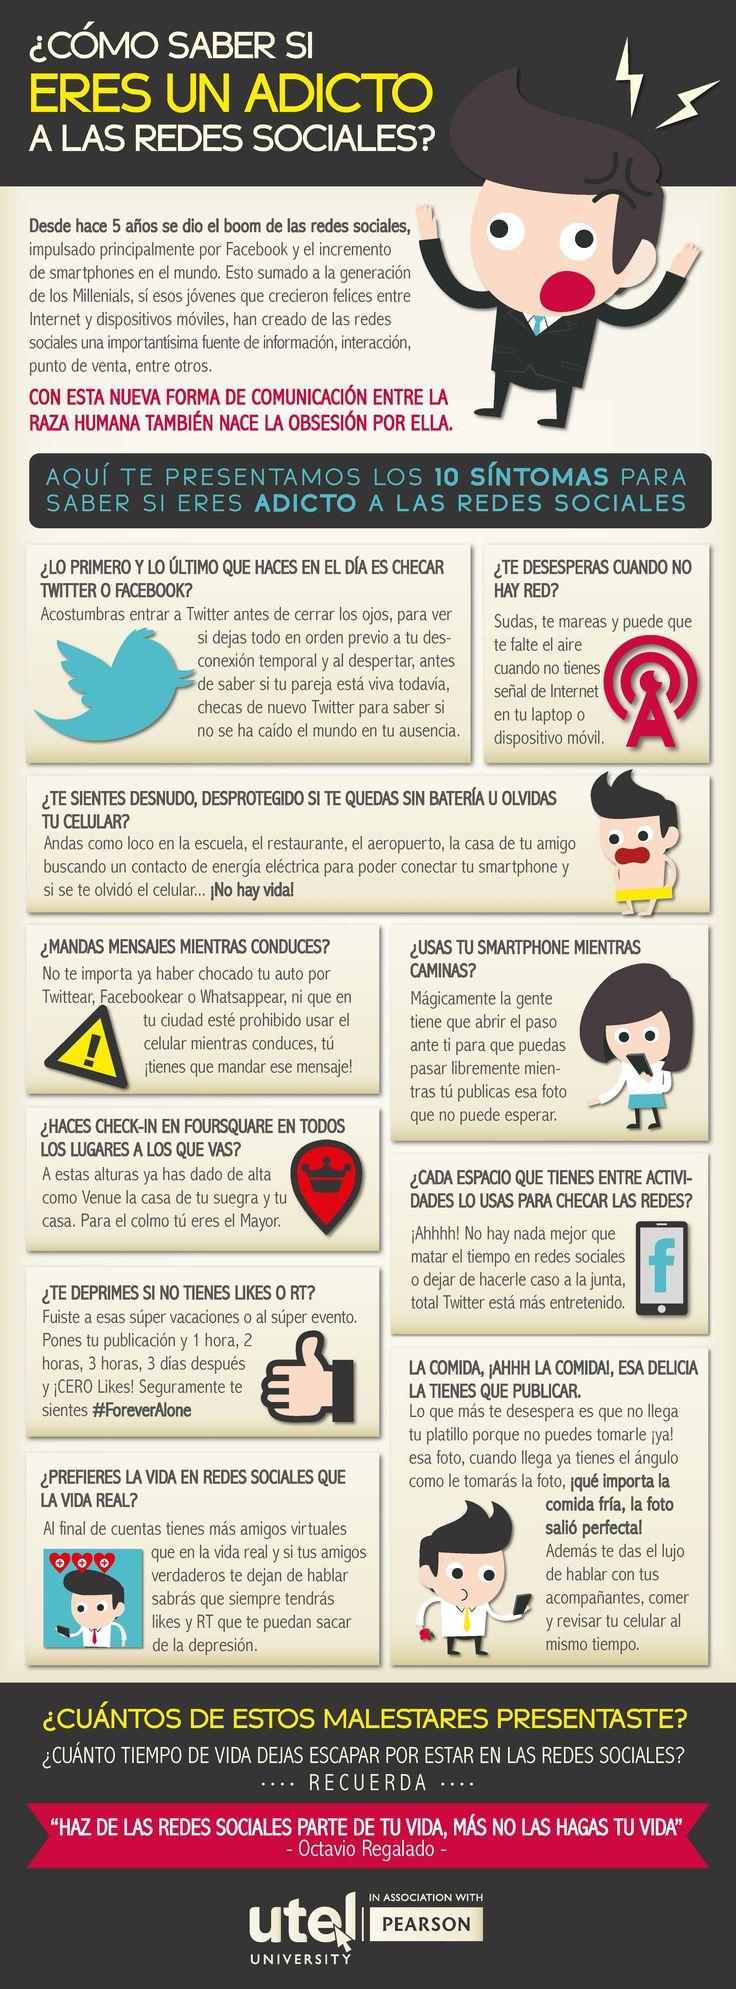 ¿Eres adicto a las Redes Sociales? #infografia